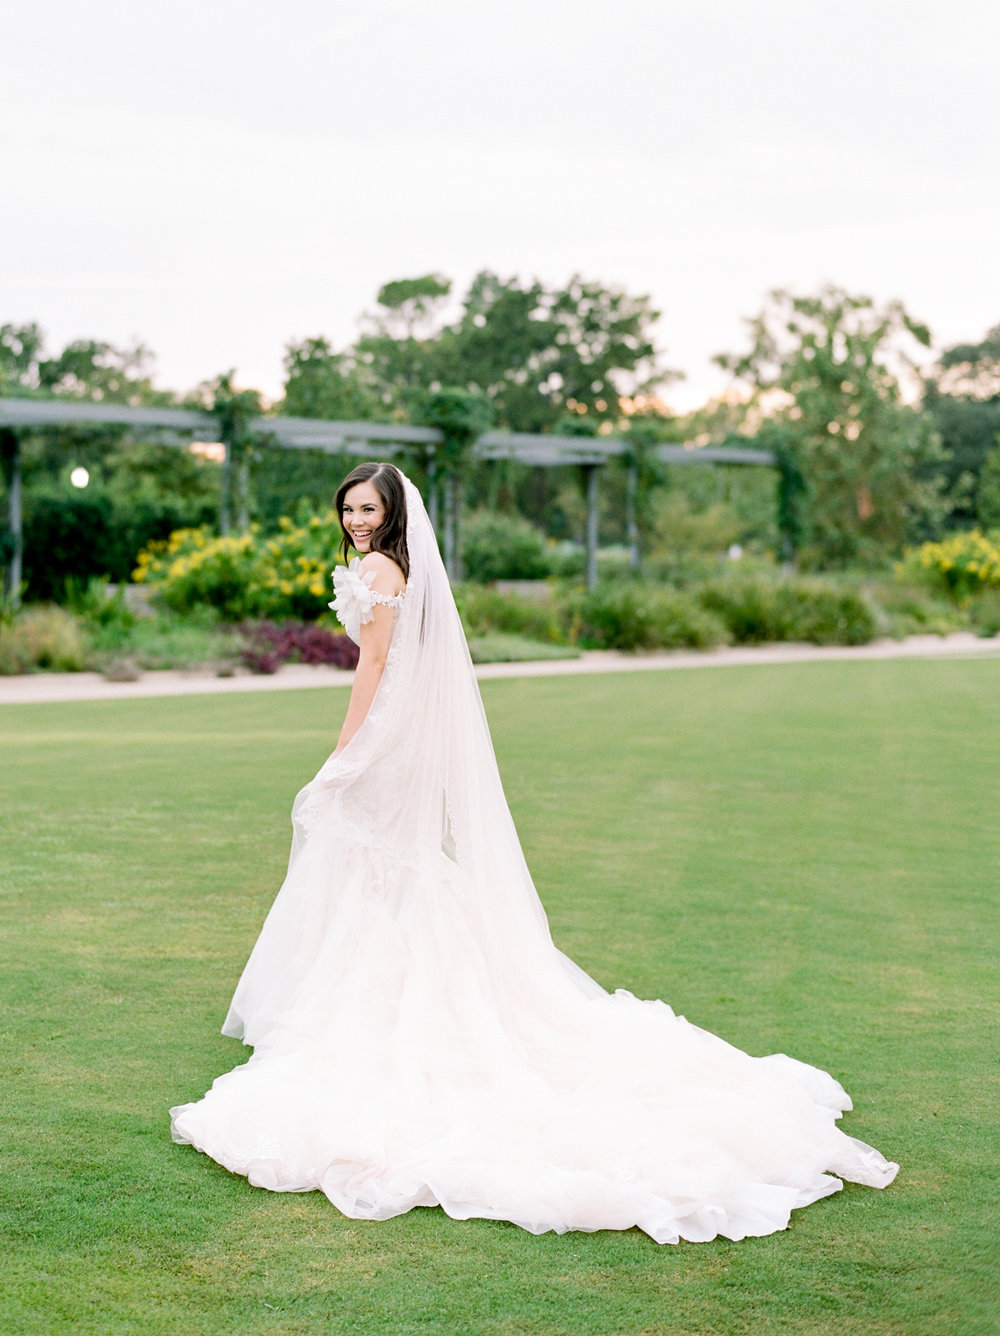 Fine-Art-Film-Houston-Wedding-Photographer-Best-Top-Luxury-Texas-Austin-Dallas-Destination-Dana-Fernandez-Photography-Portrait-Bridals-McGovern-Centennial-Gardens-8.jpg